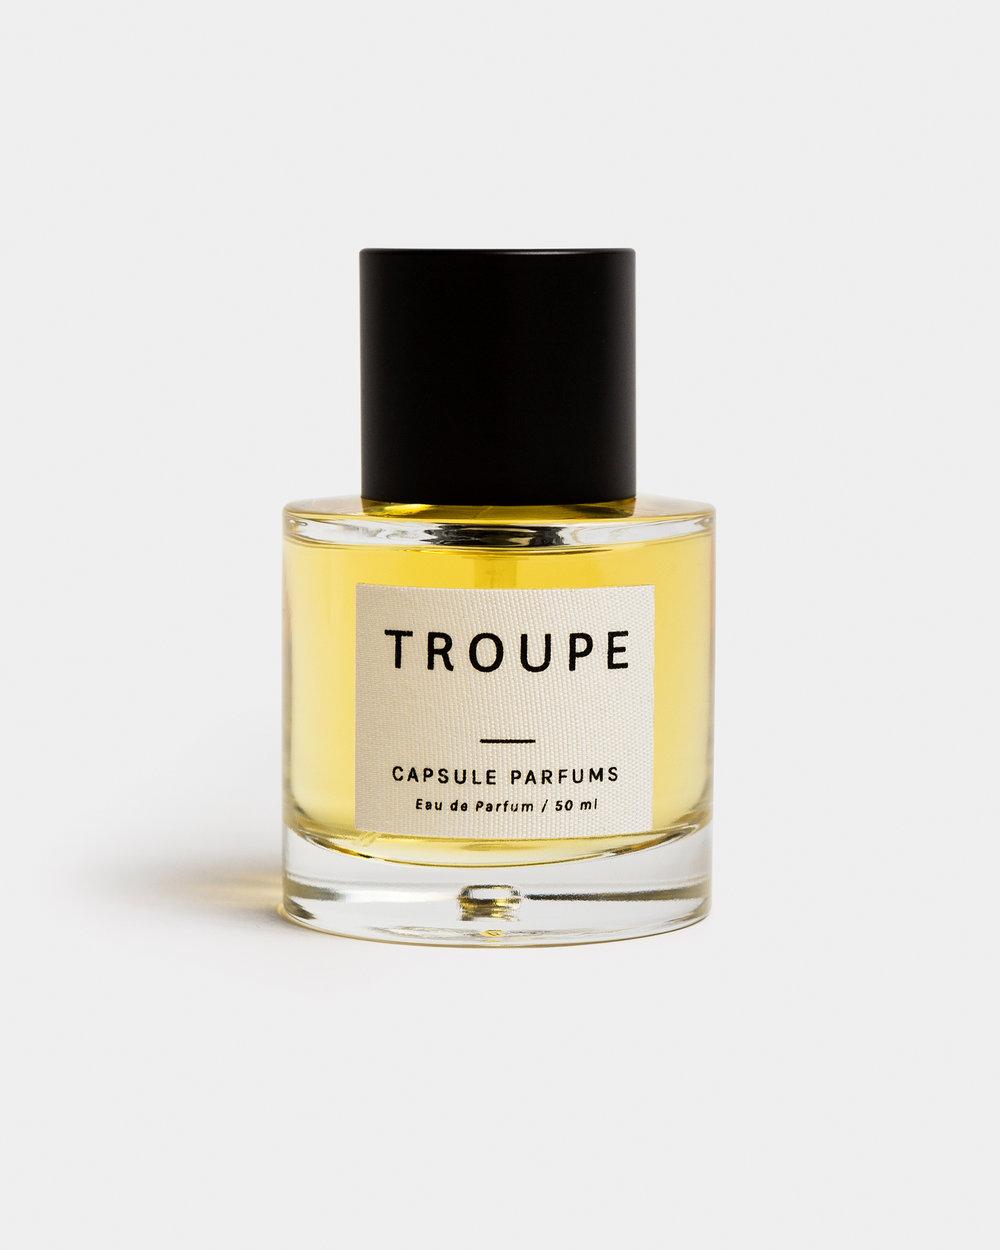 Capsule Parfums / Capsule Parfumerie